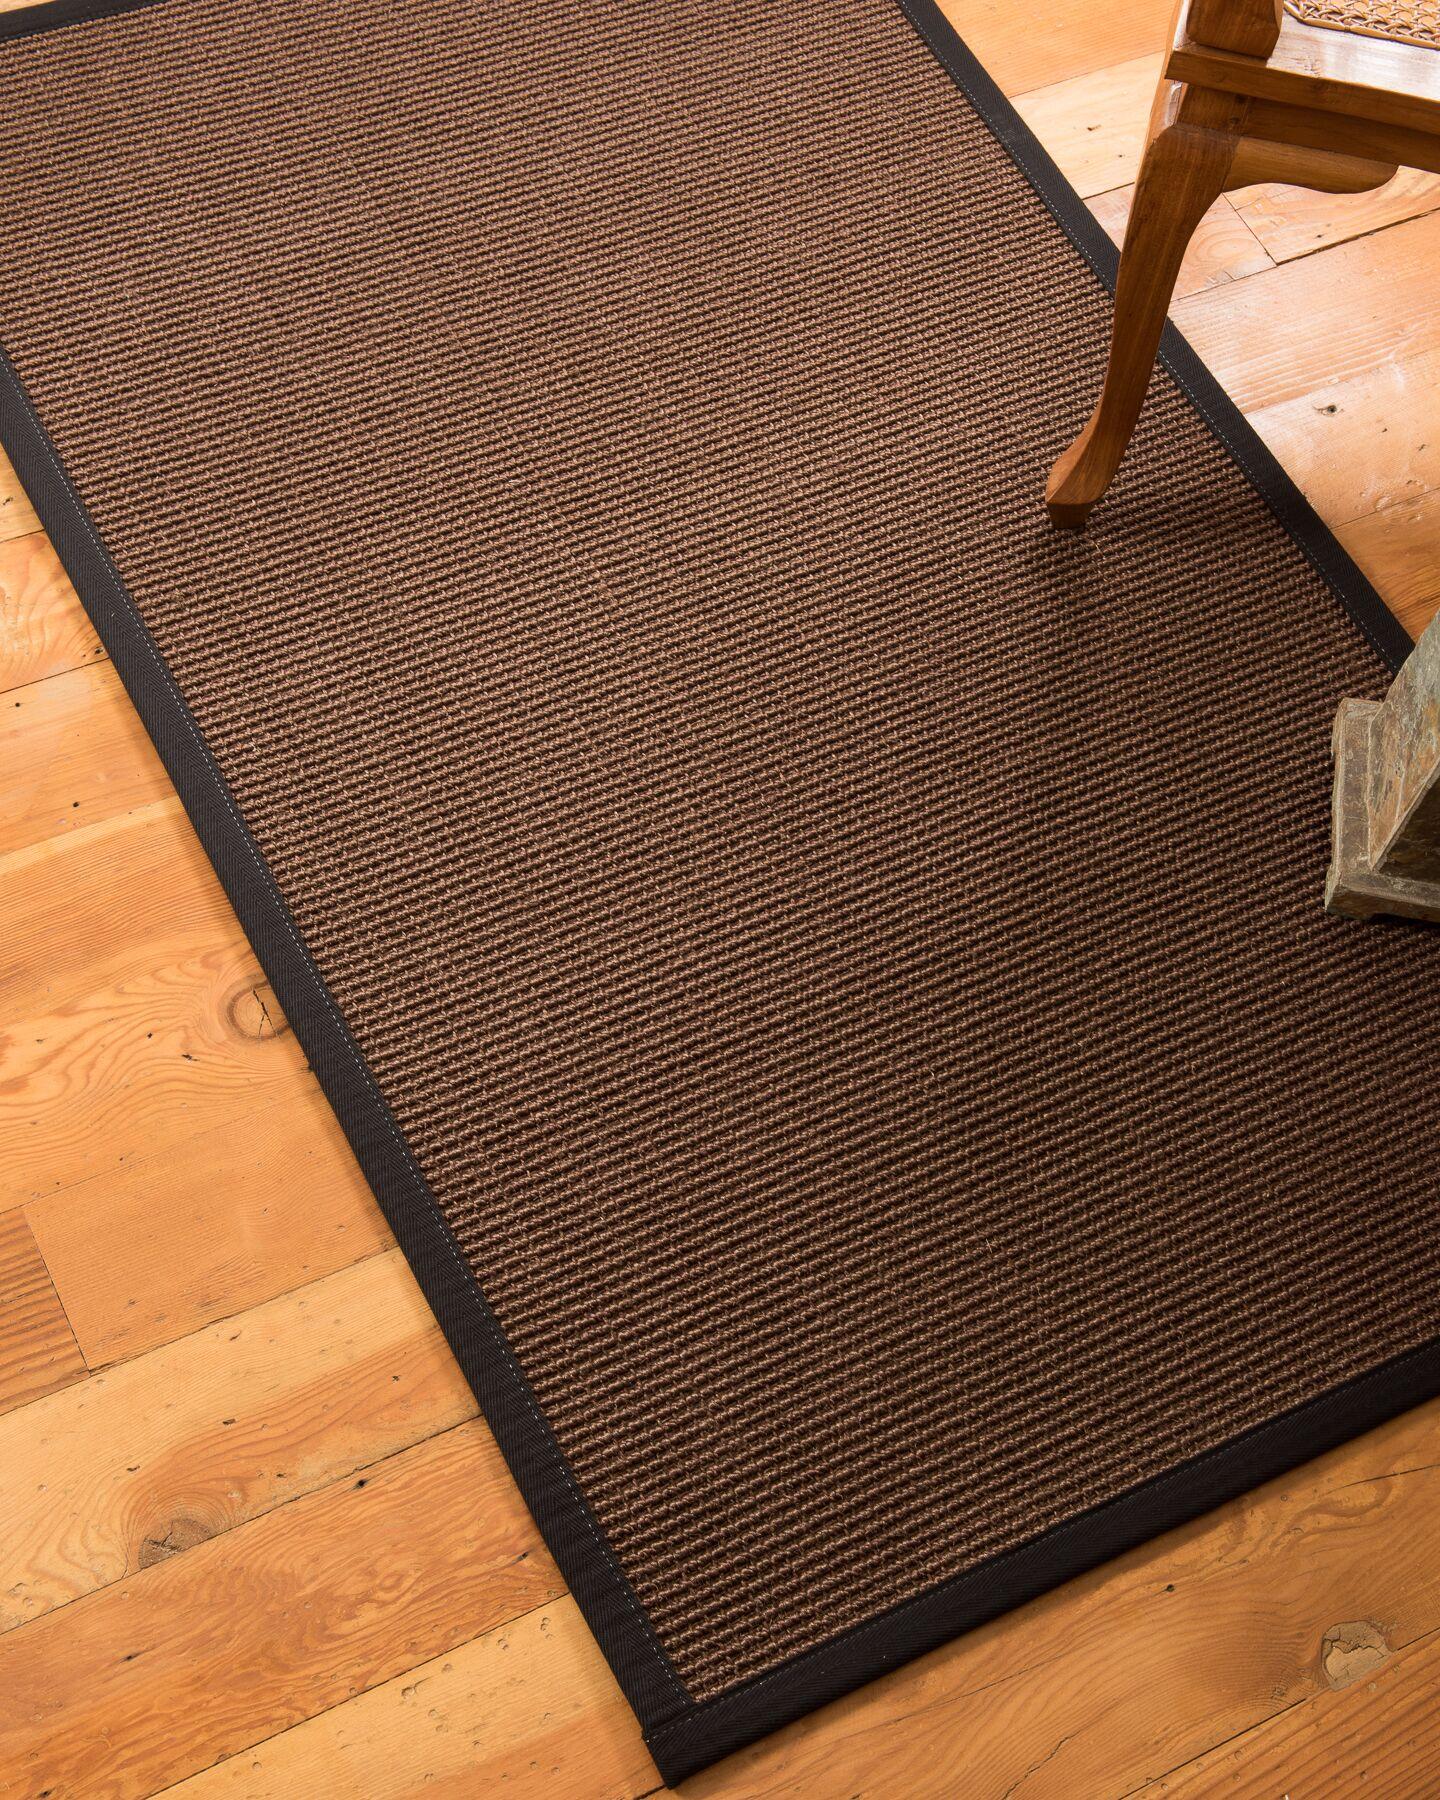 Ripley Hand-Woven Brown Area Rug Rug Size: Rectangle 3' x 5'